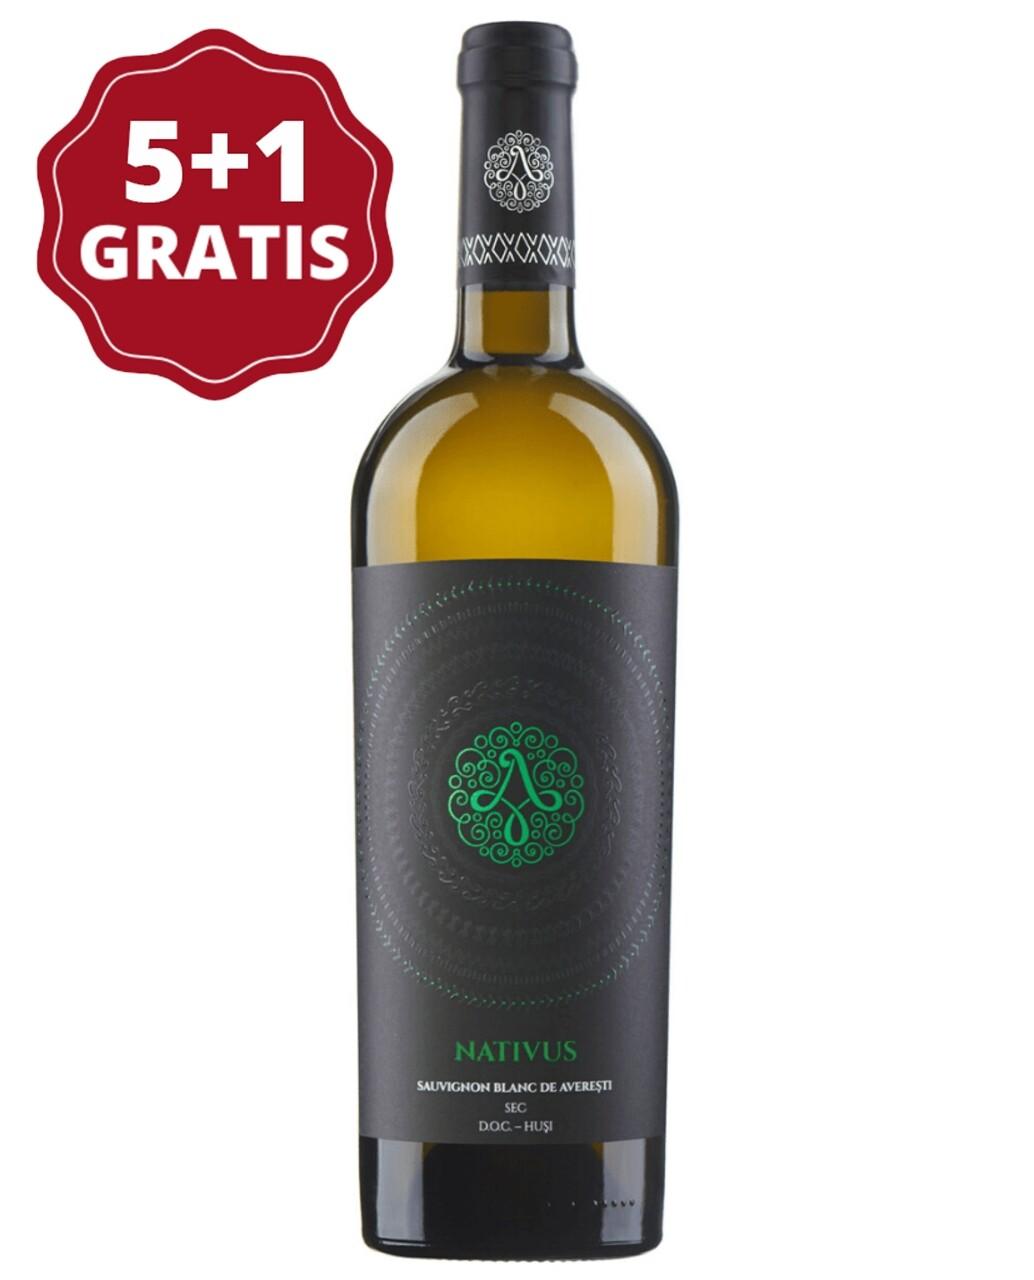 Sauvignon Blanc de Averesti Nativus 5+1